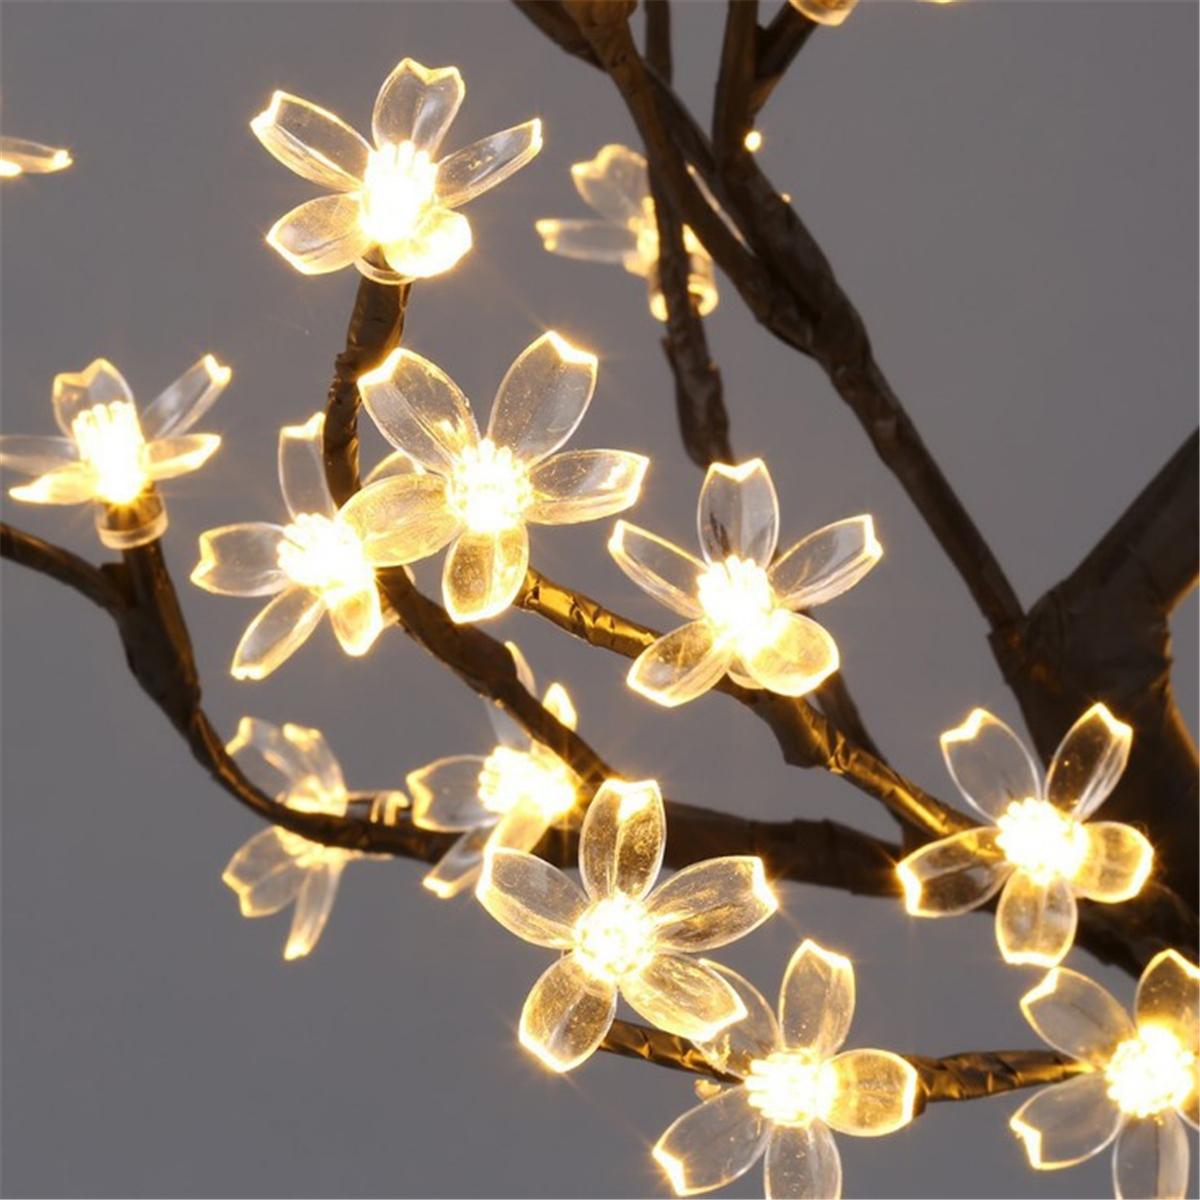 45cm LED Cherry Blossom Bonsai Sakura Tree with 72 LED Fairy Light Table Lamp